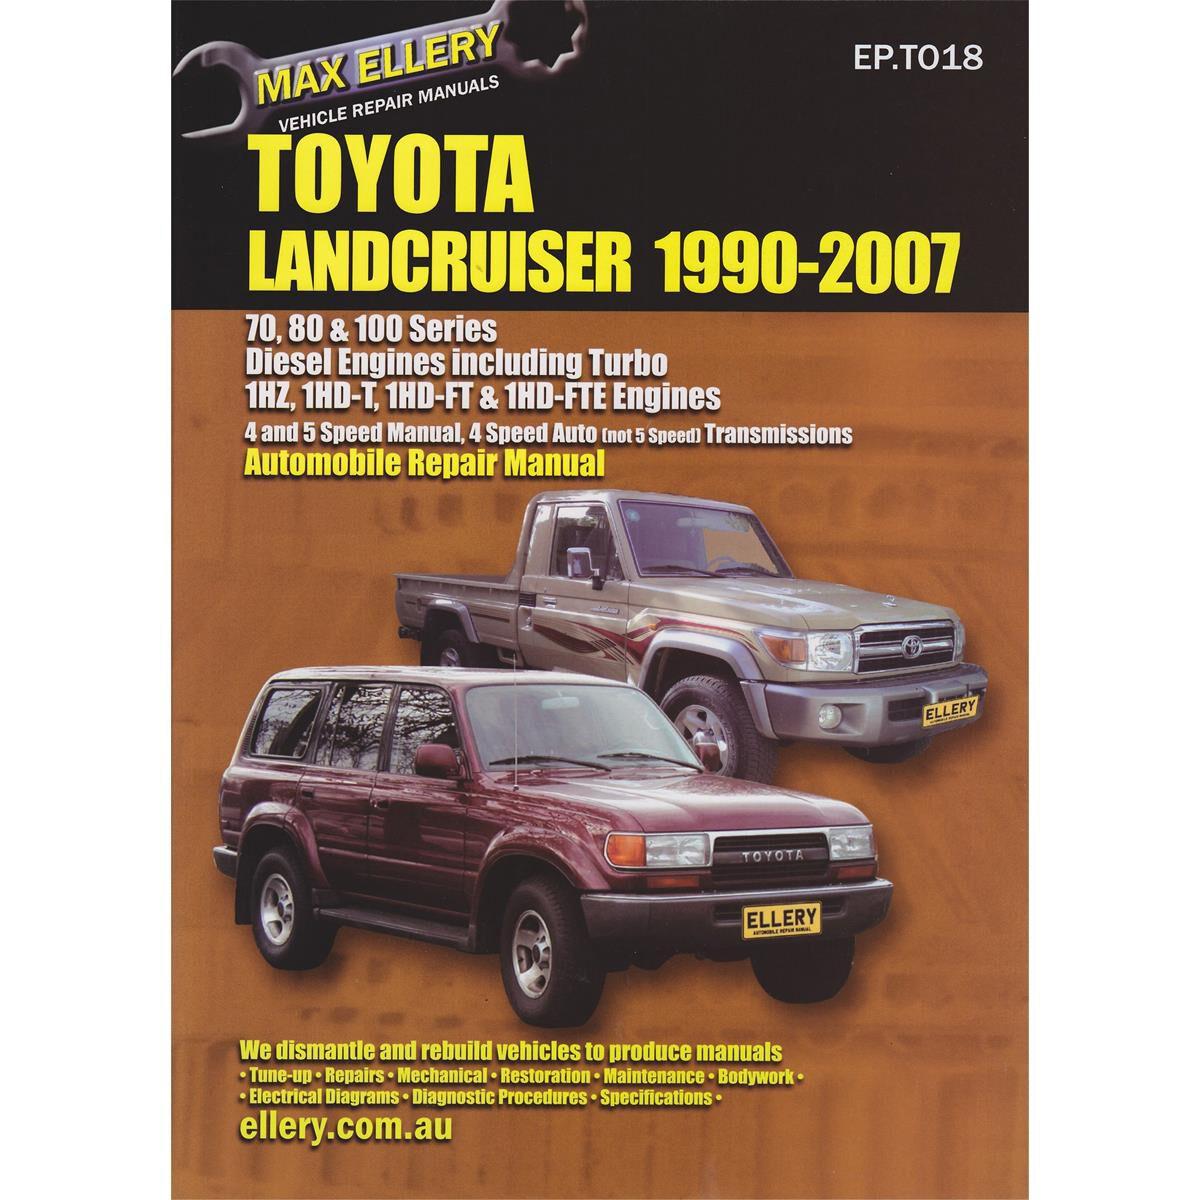 max ellery car manual for toyota landcruiser 1990 2007 ep t018 rh supercheapauto com au